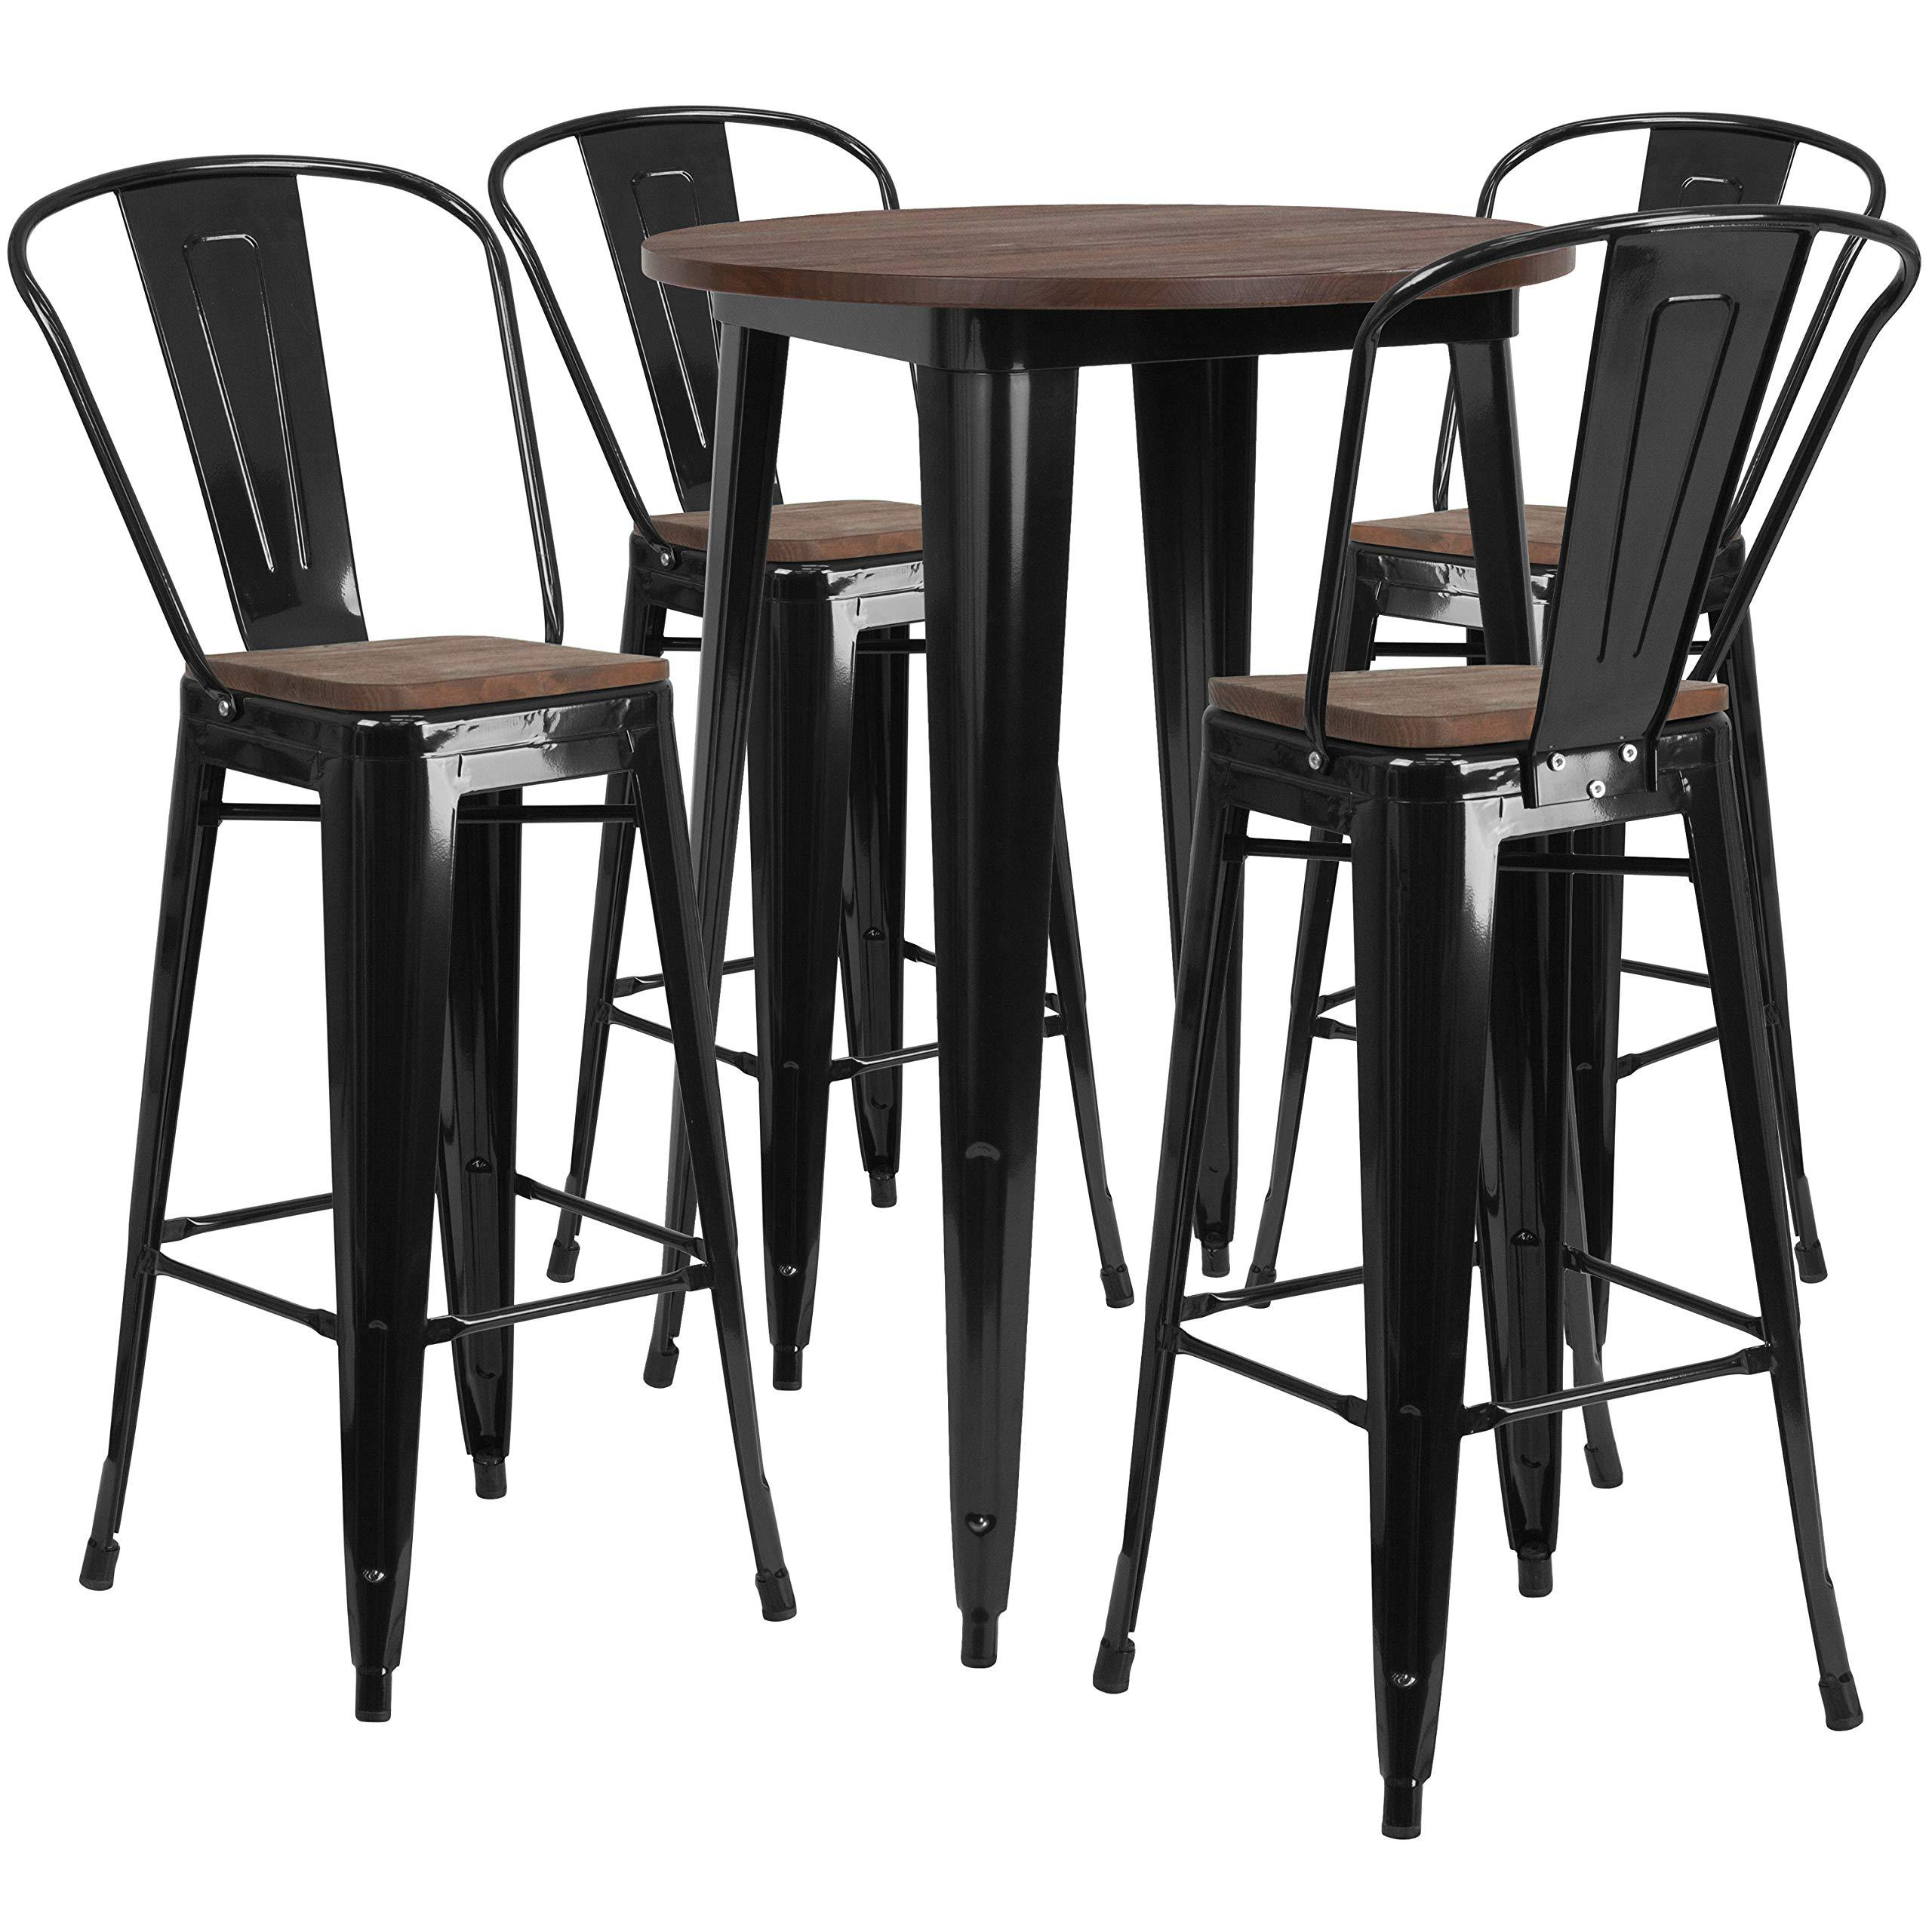 Taylor + Logan Metal / Wood Bar Table and High Back 4-Stool Set, Black by Taylor + Logan